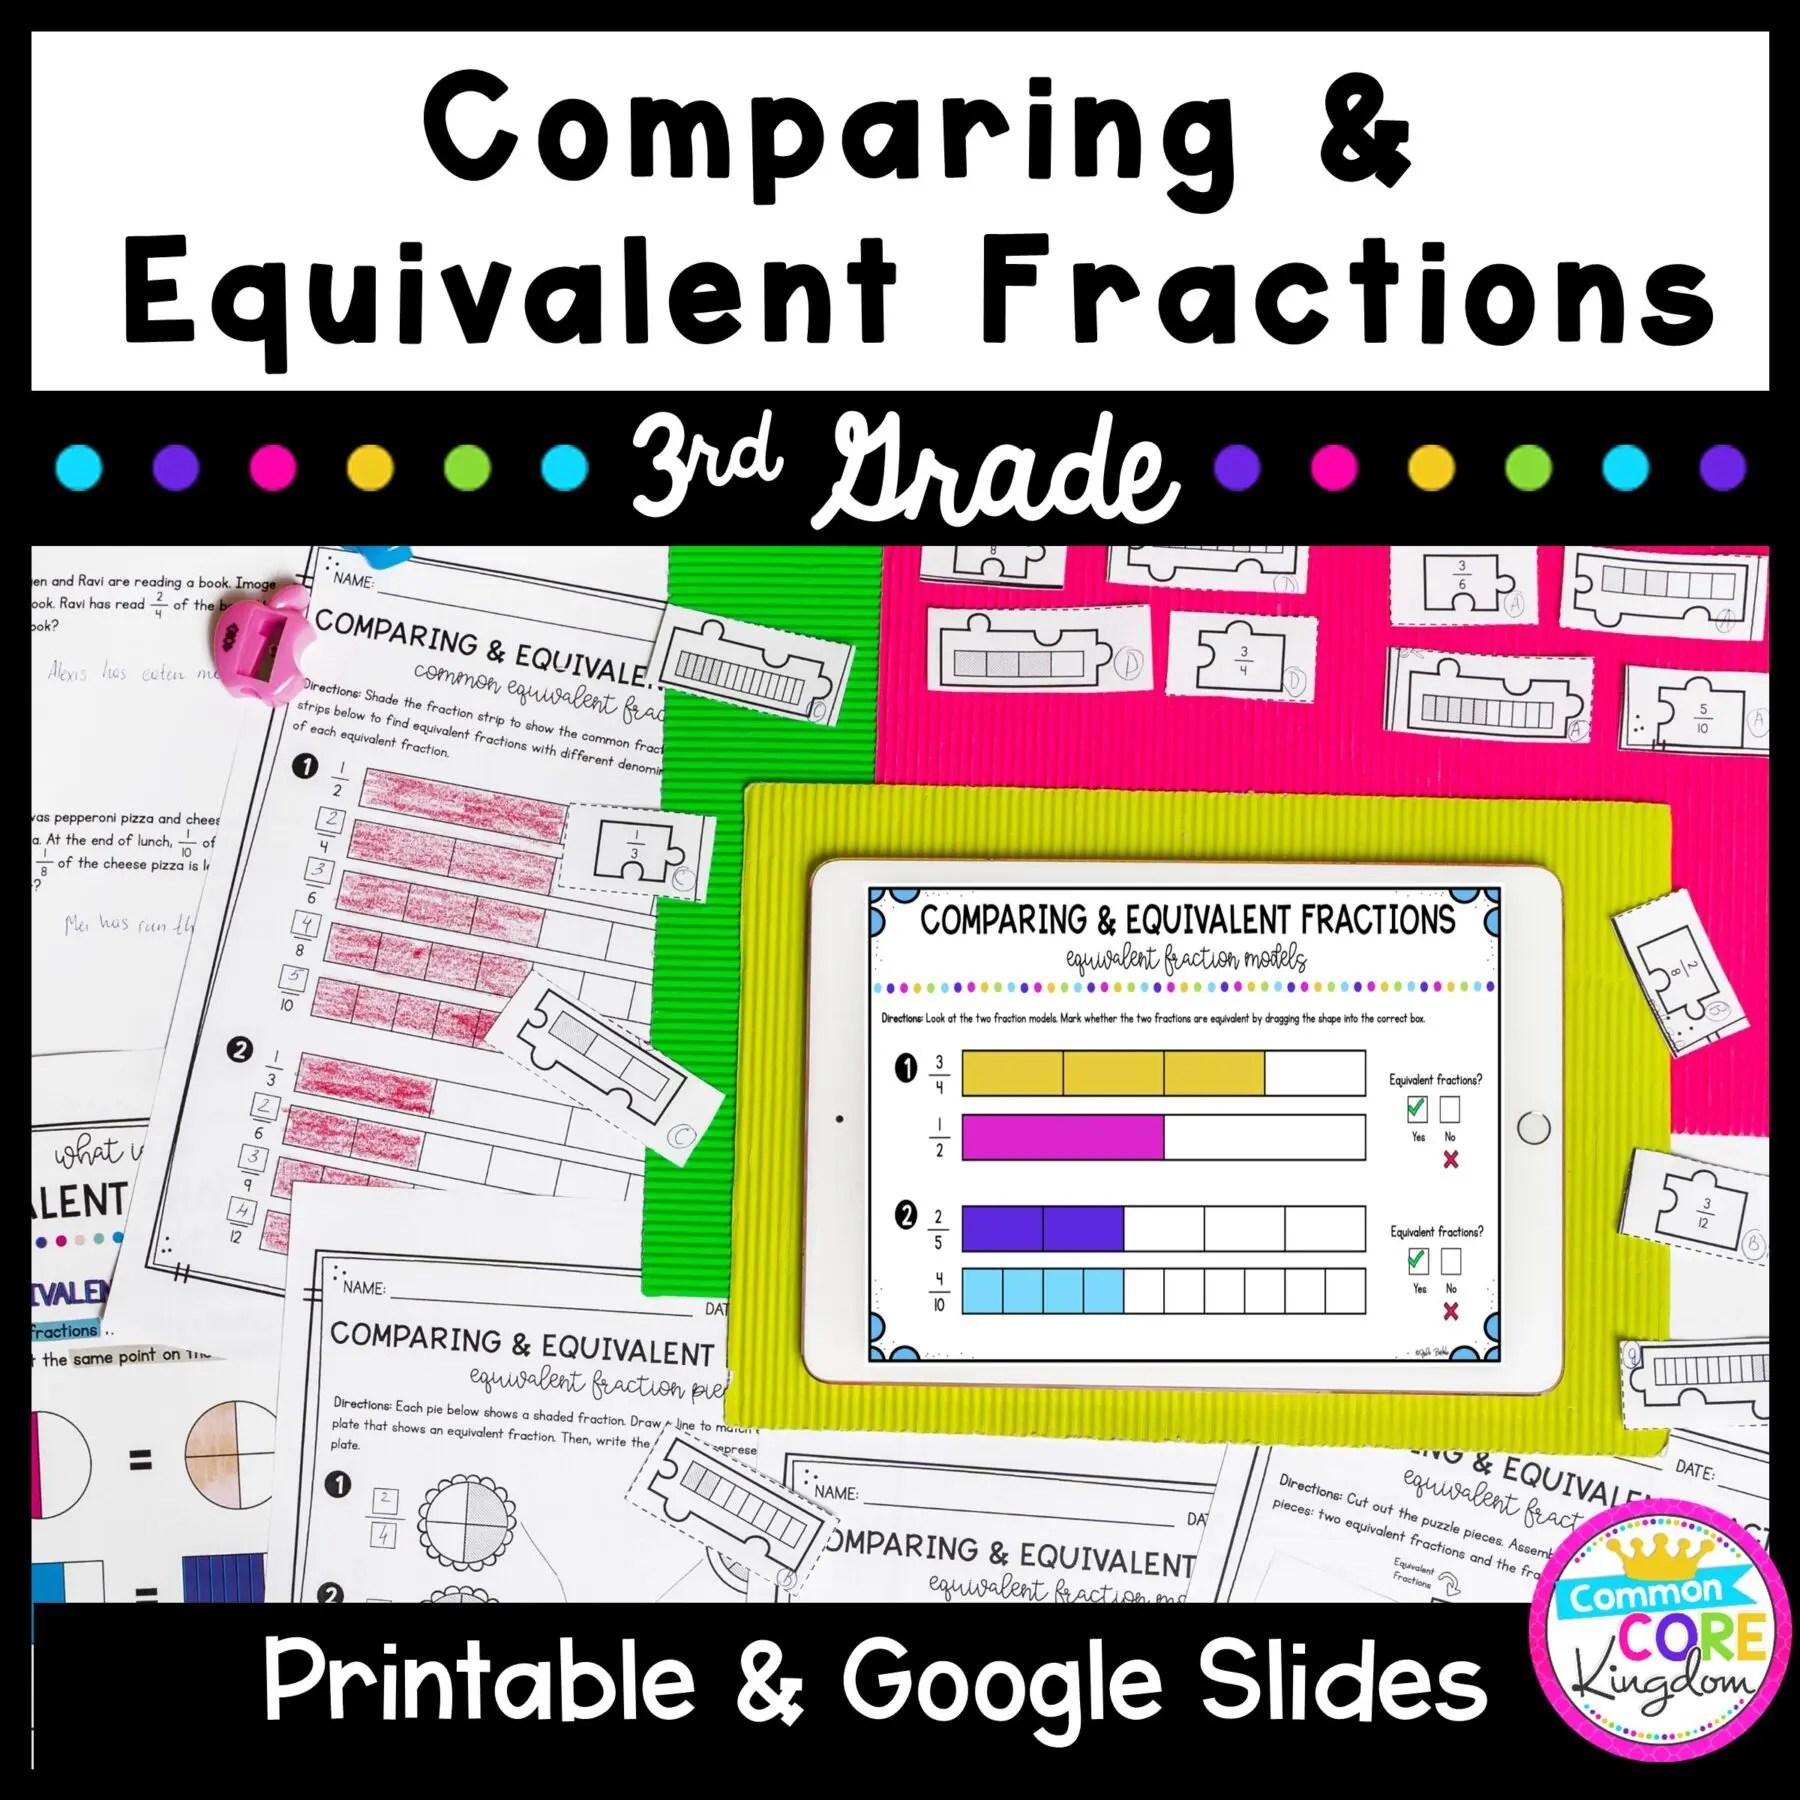 medium resolution of Comparing Equivalent Fractions 3rd Grade Math   Common Core Kingdom